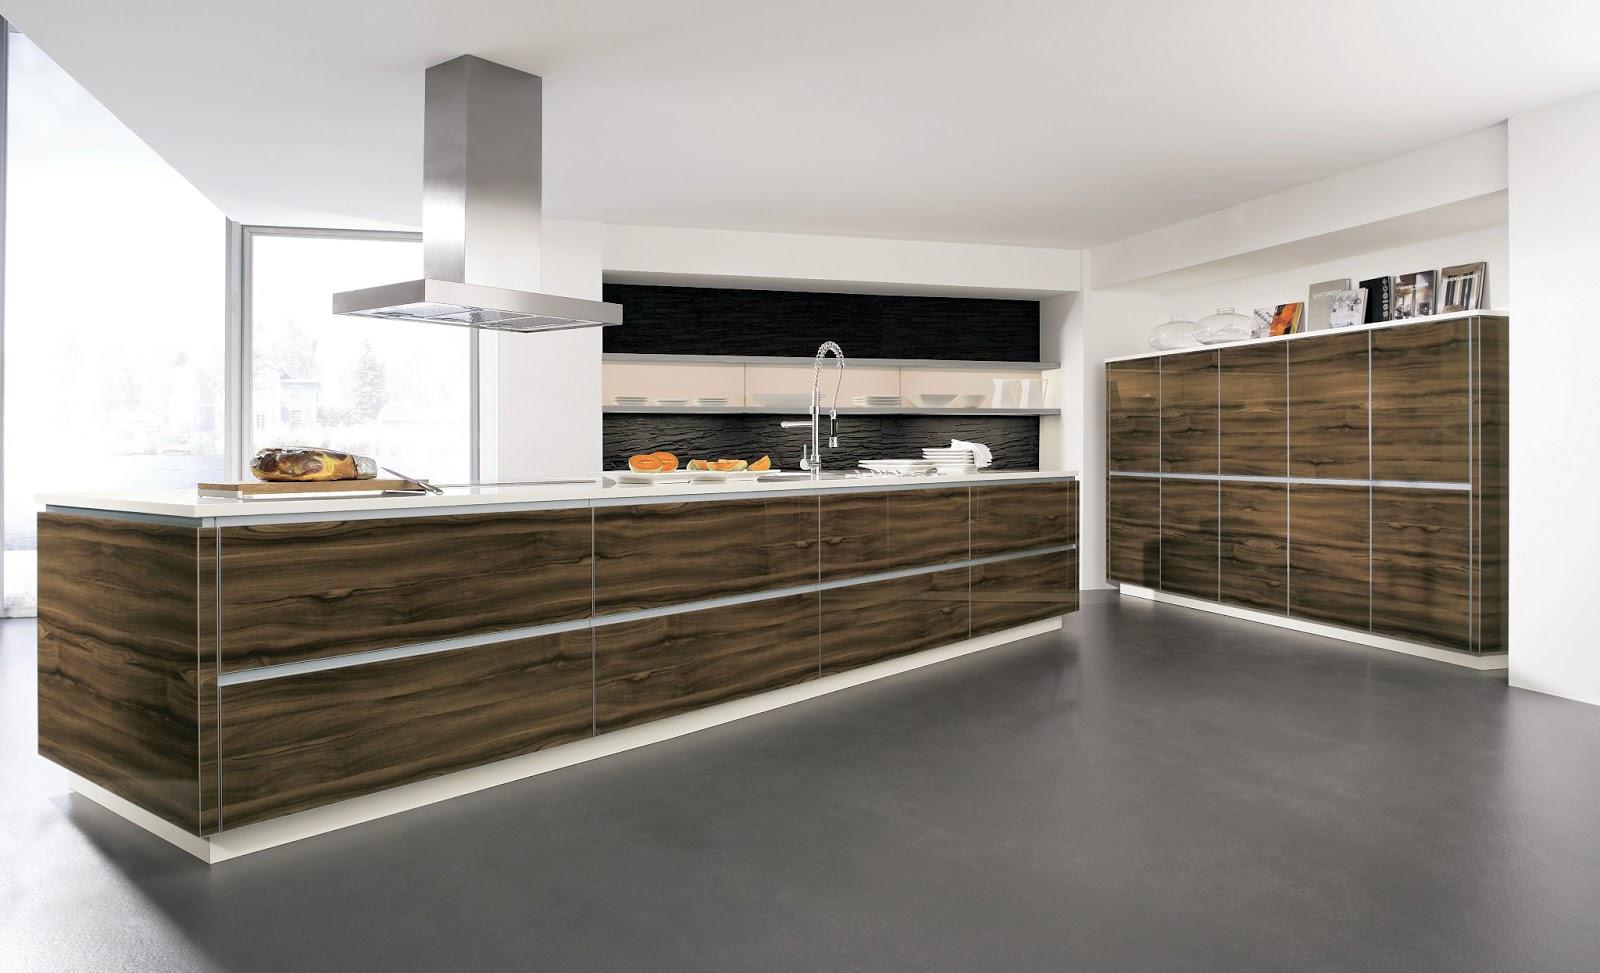 Cuisine design bois Ilot cuisine bois massif